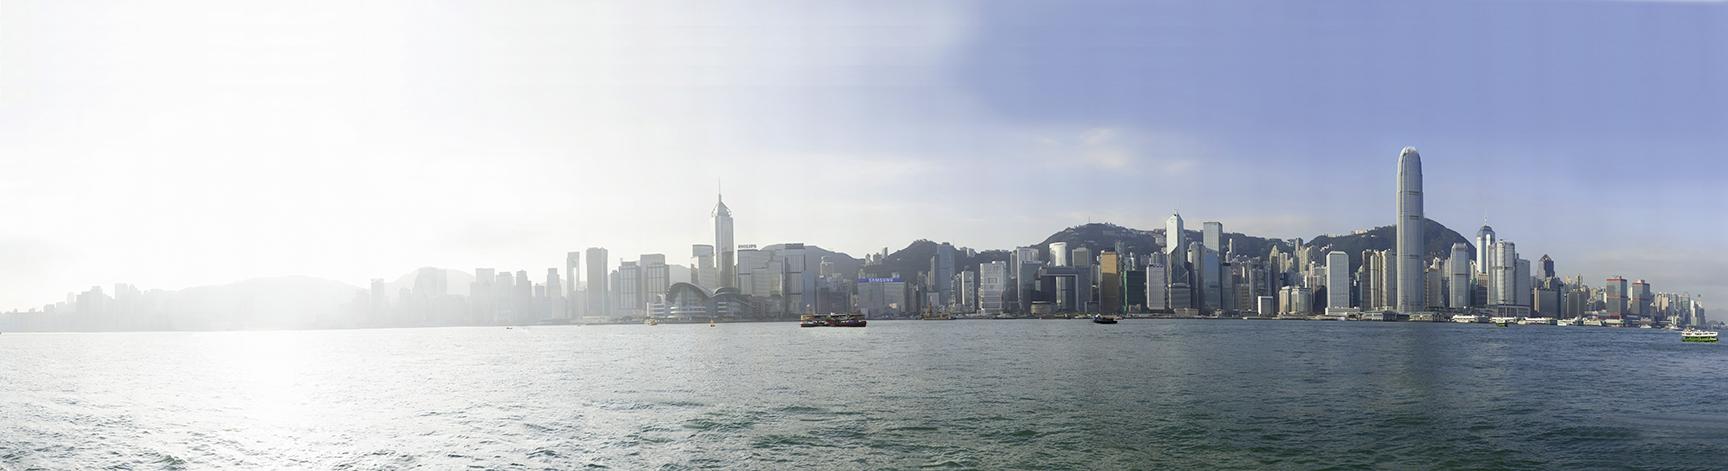 Hong Kong daytime